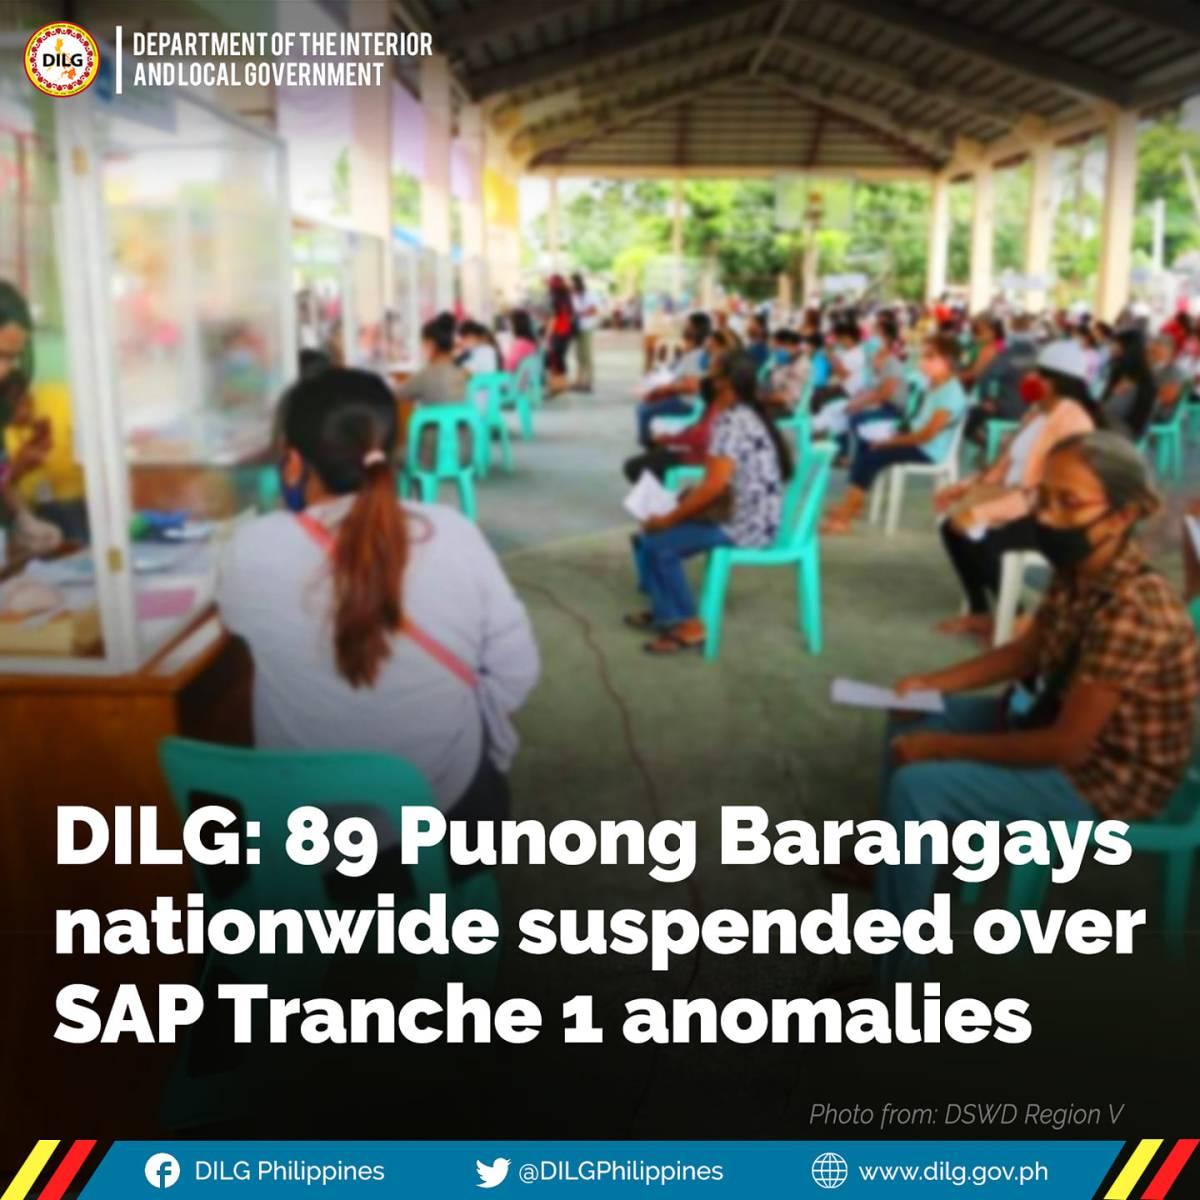 punong barangays suspened